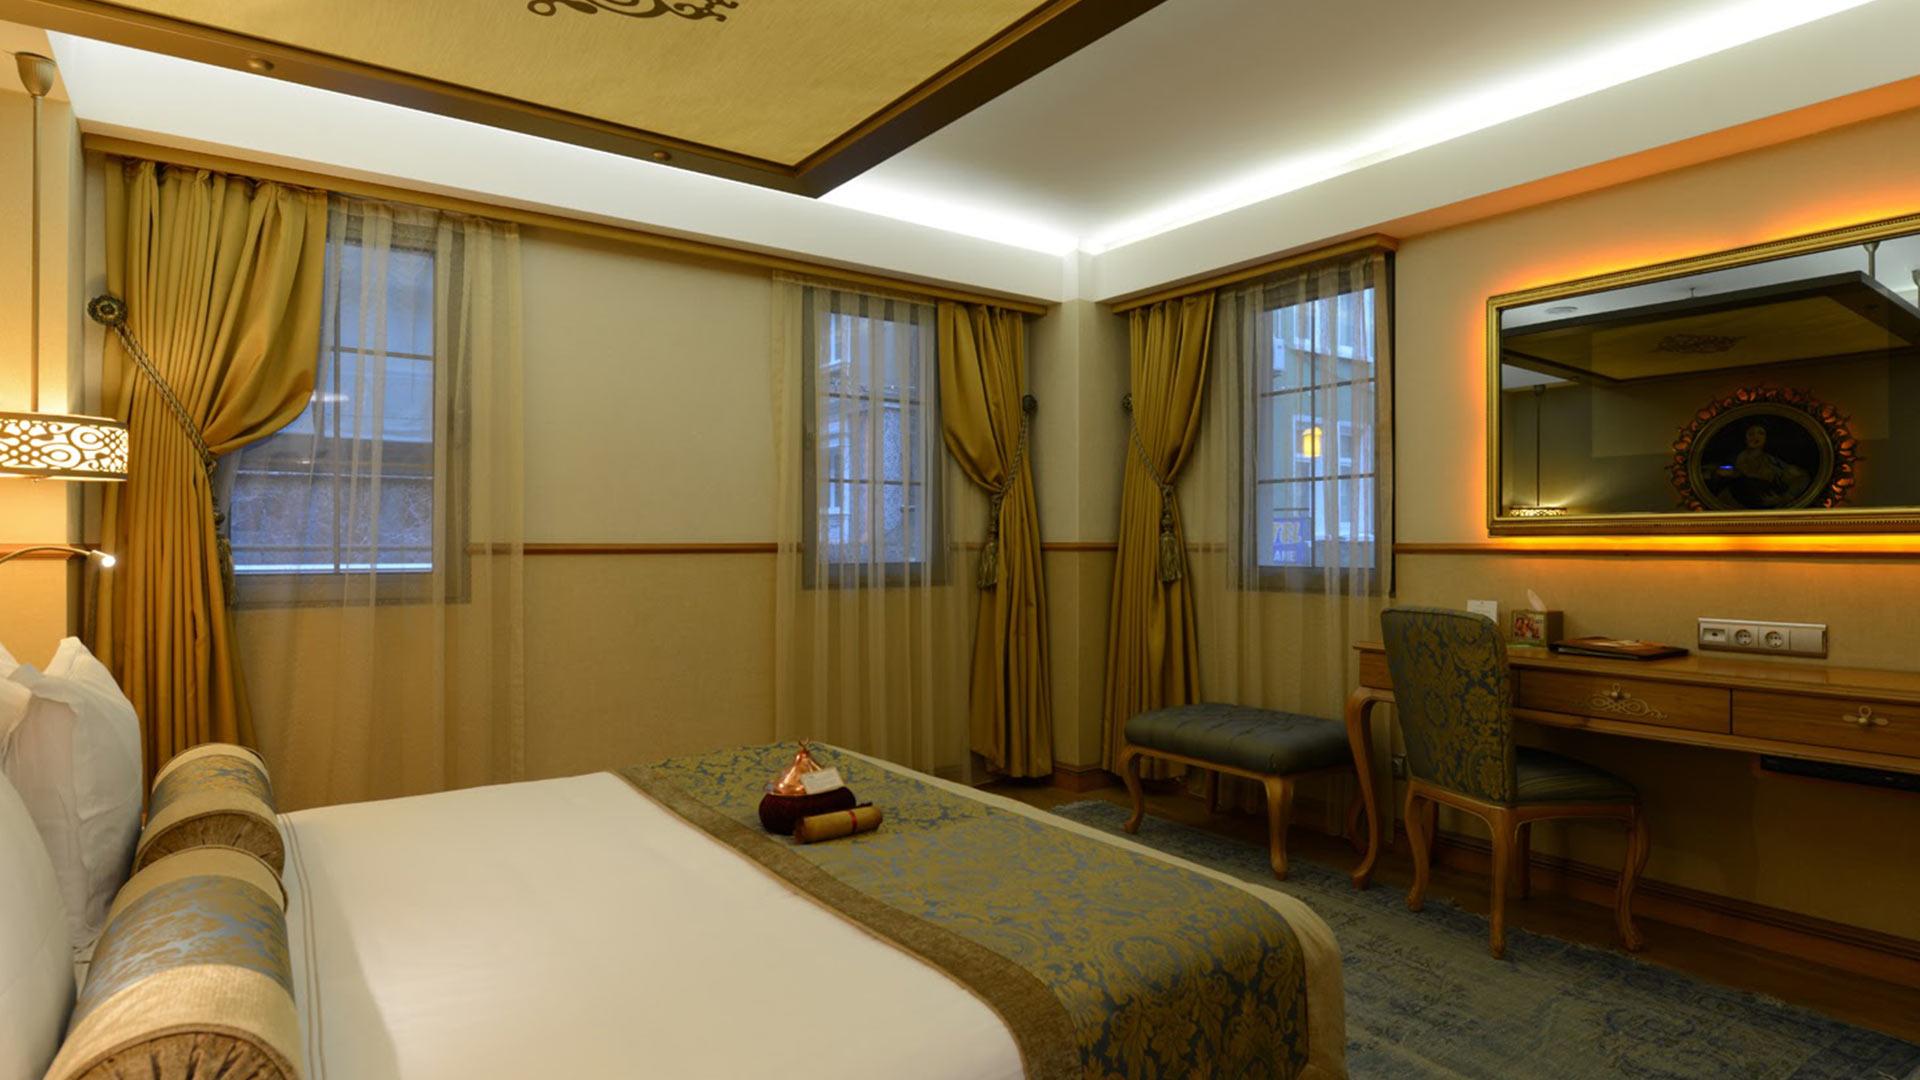 Istanbul_Hotel_Sultania_Deluxe_Room_Queen_Bed